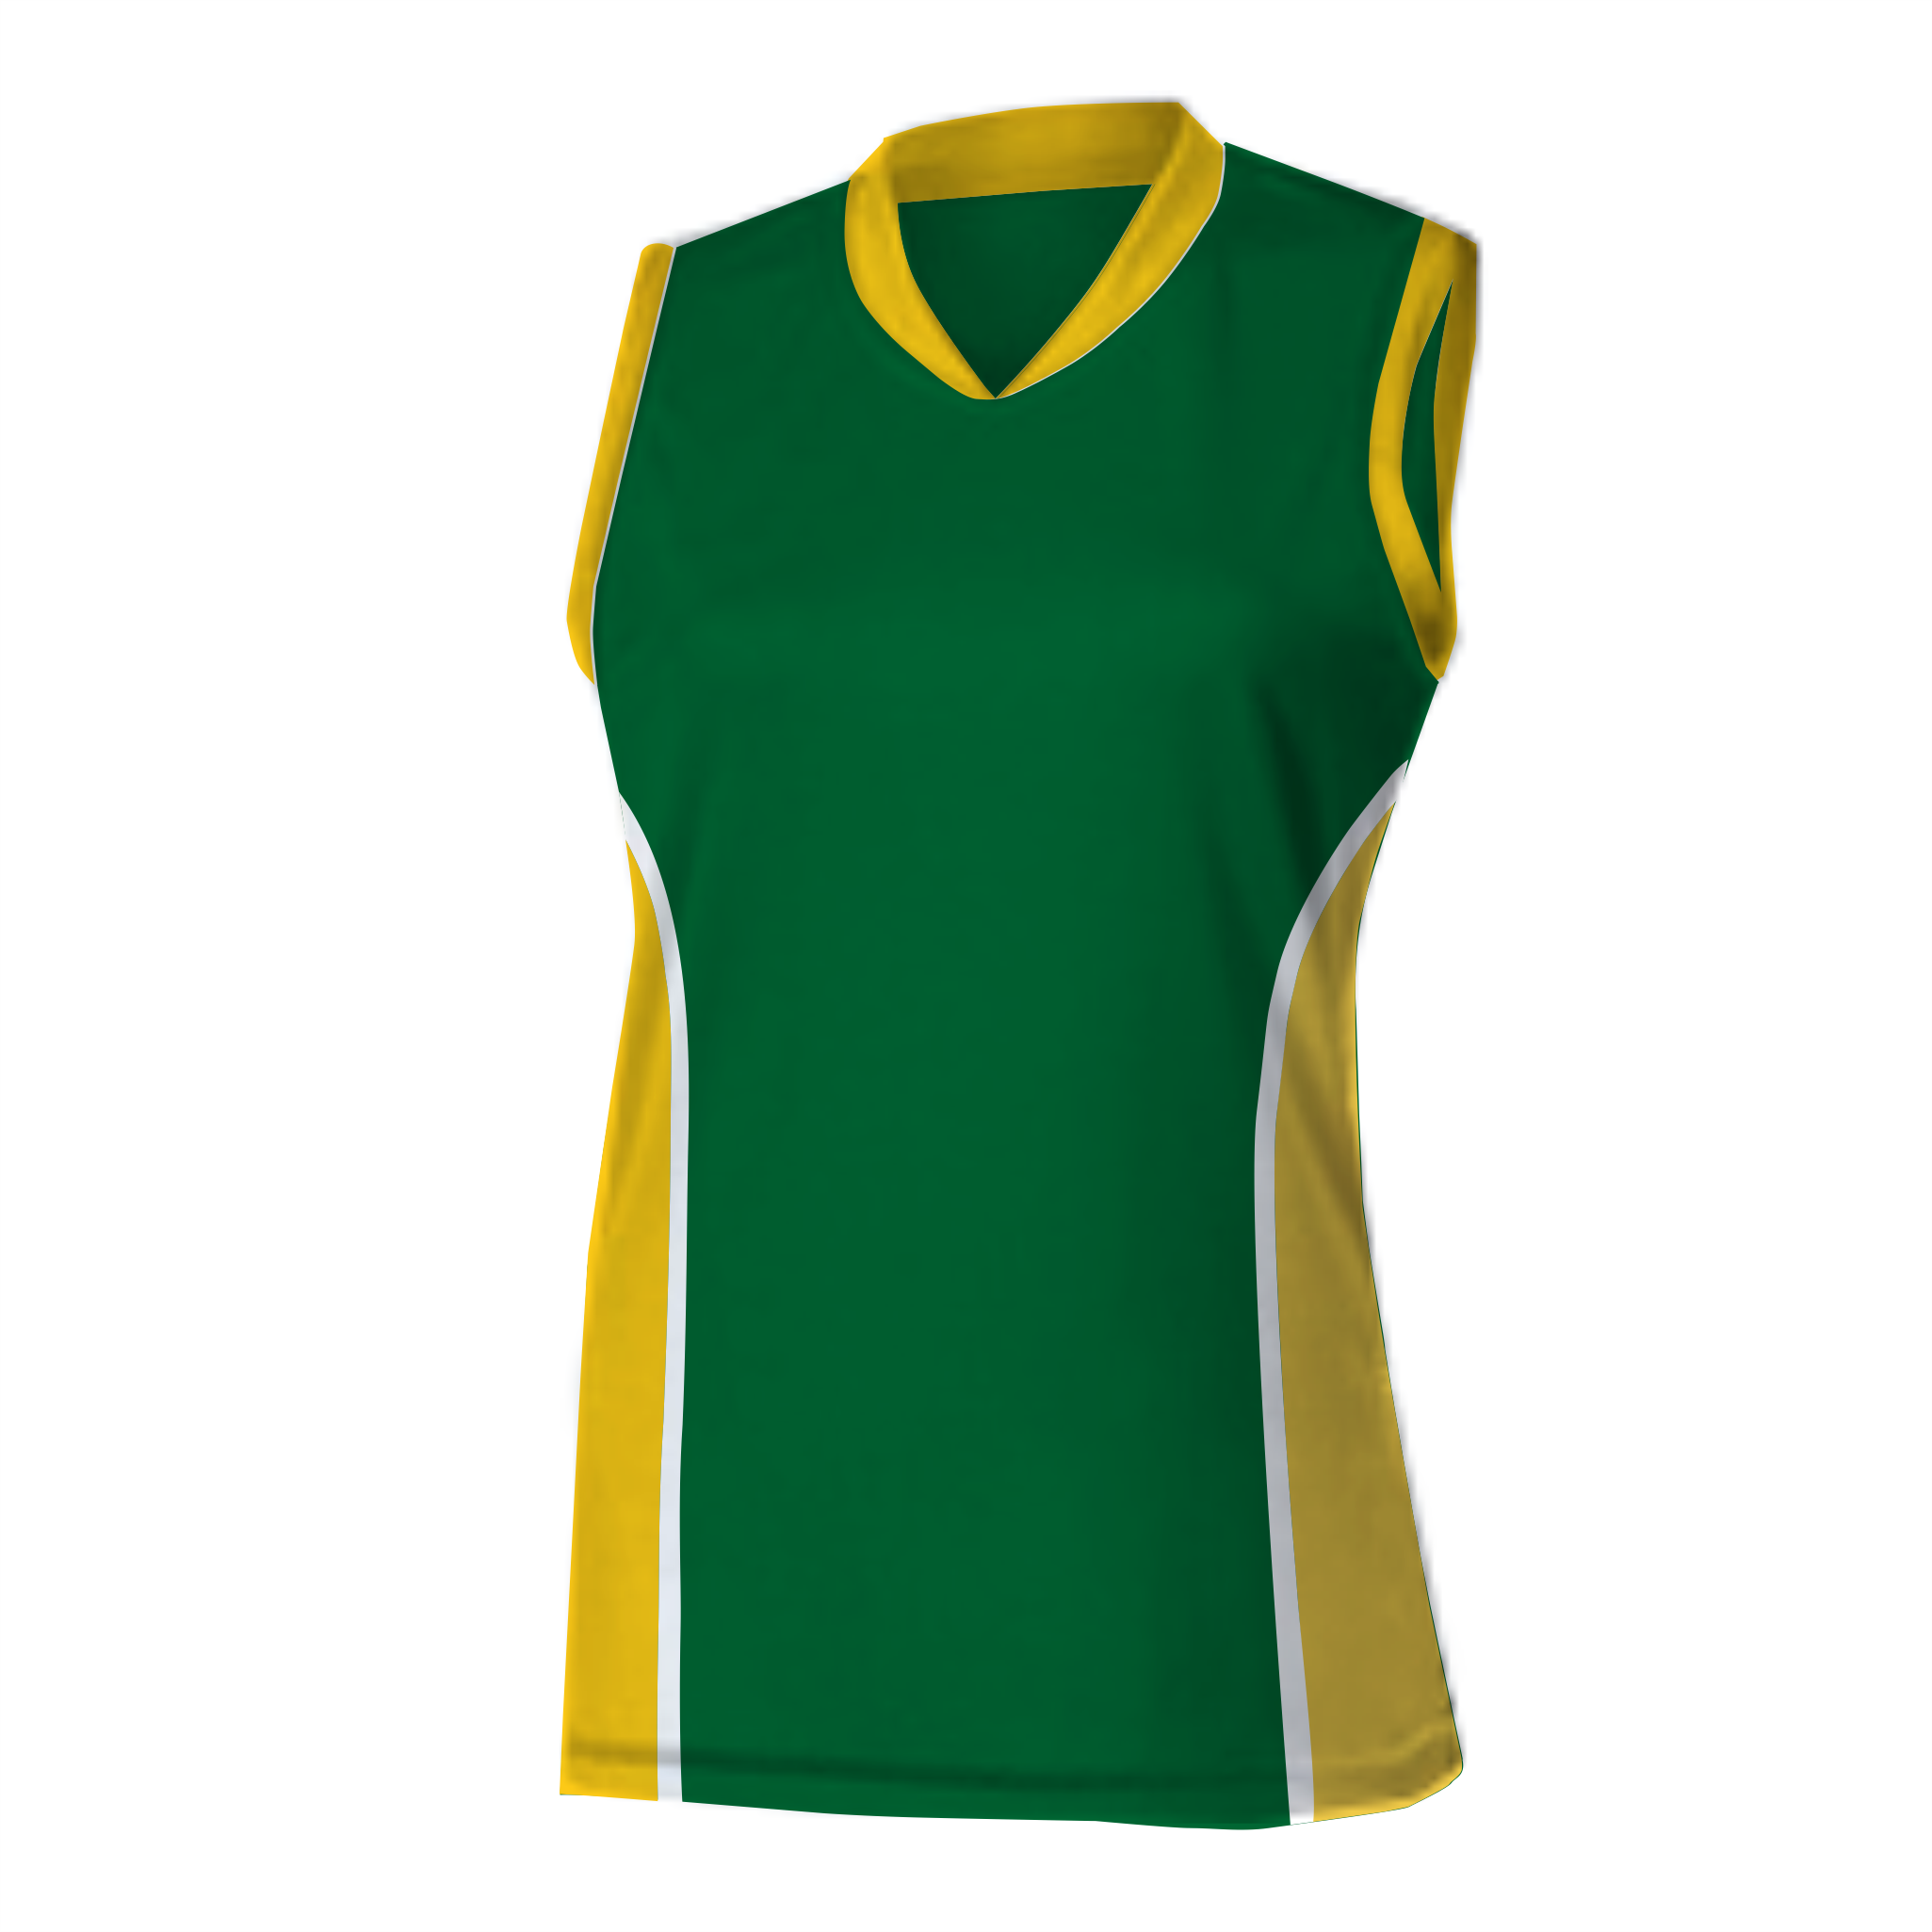 Panelled Zuco womans VB shirt - Bolt